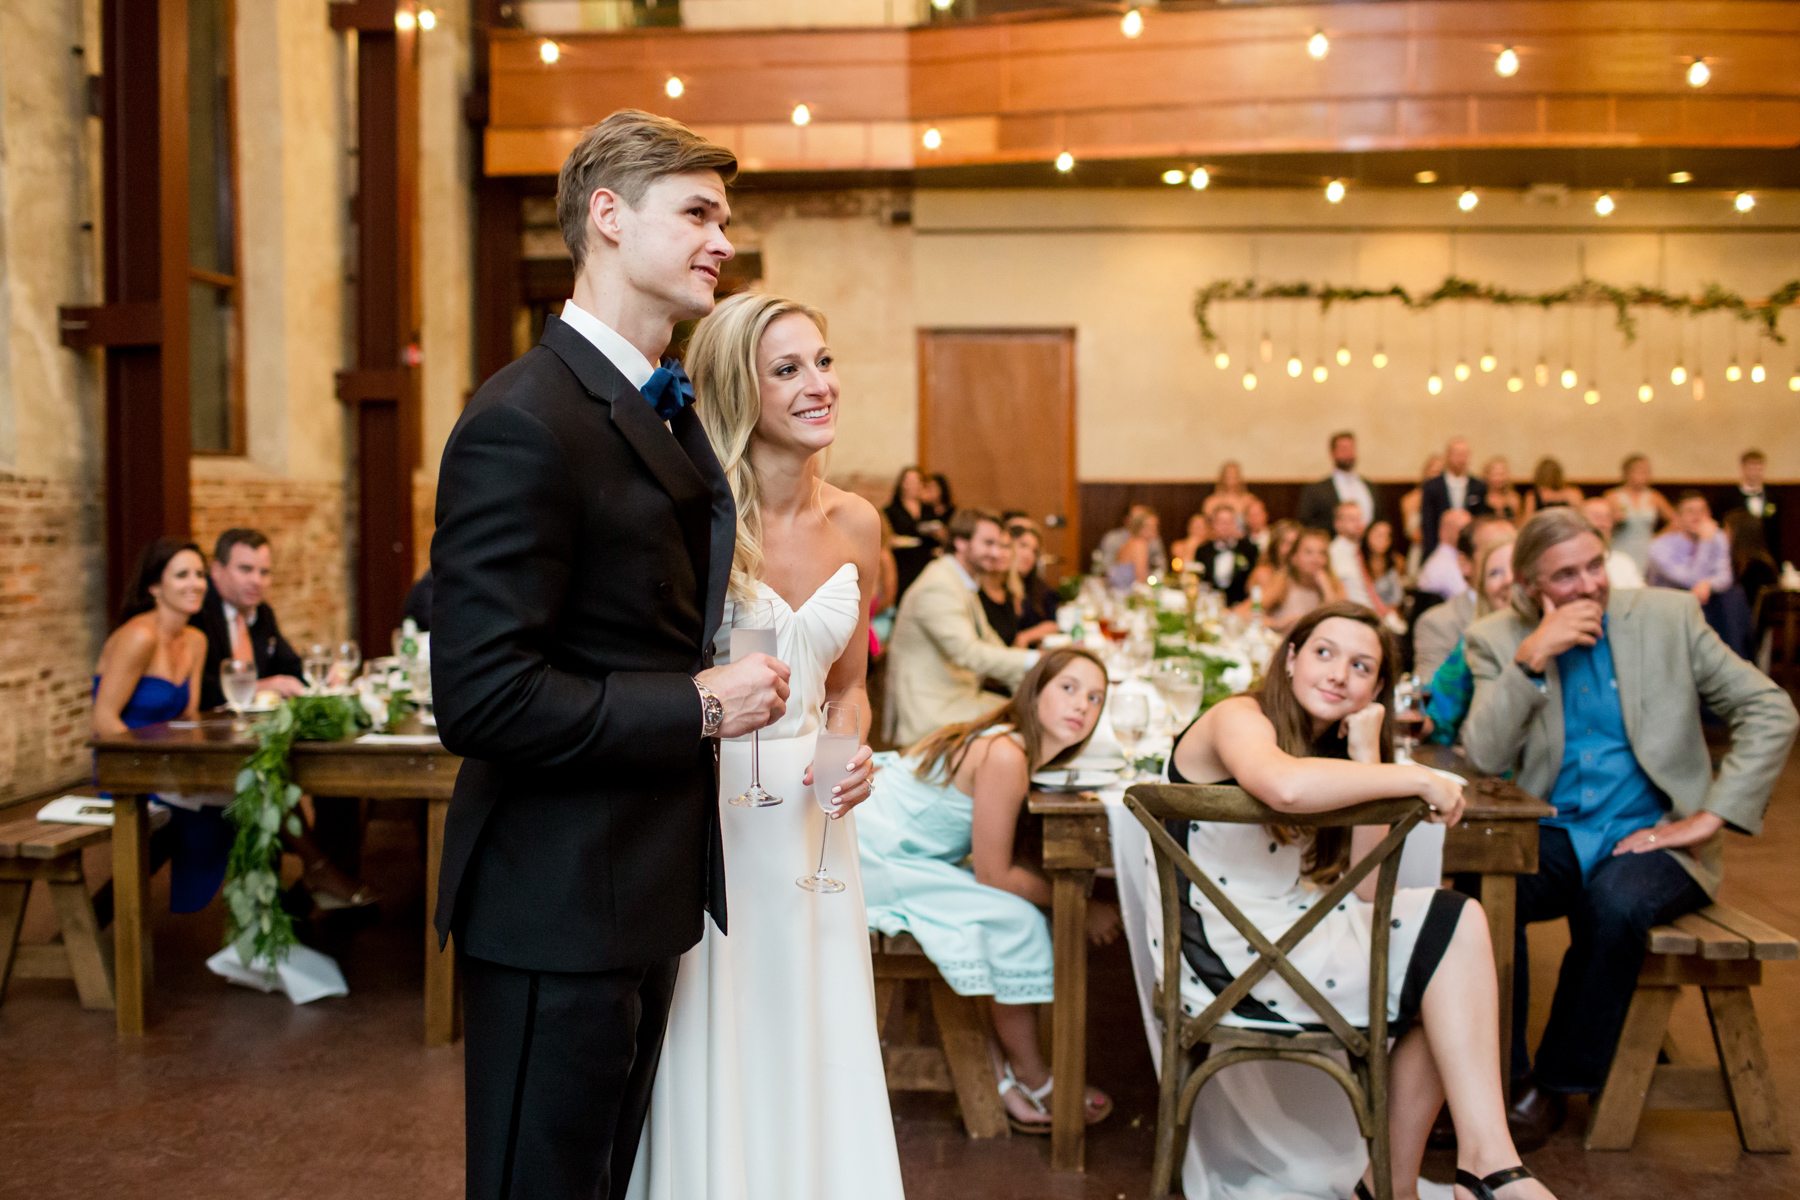 NC-wedding-venues-film-photographer-04.jpg